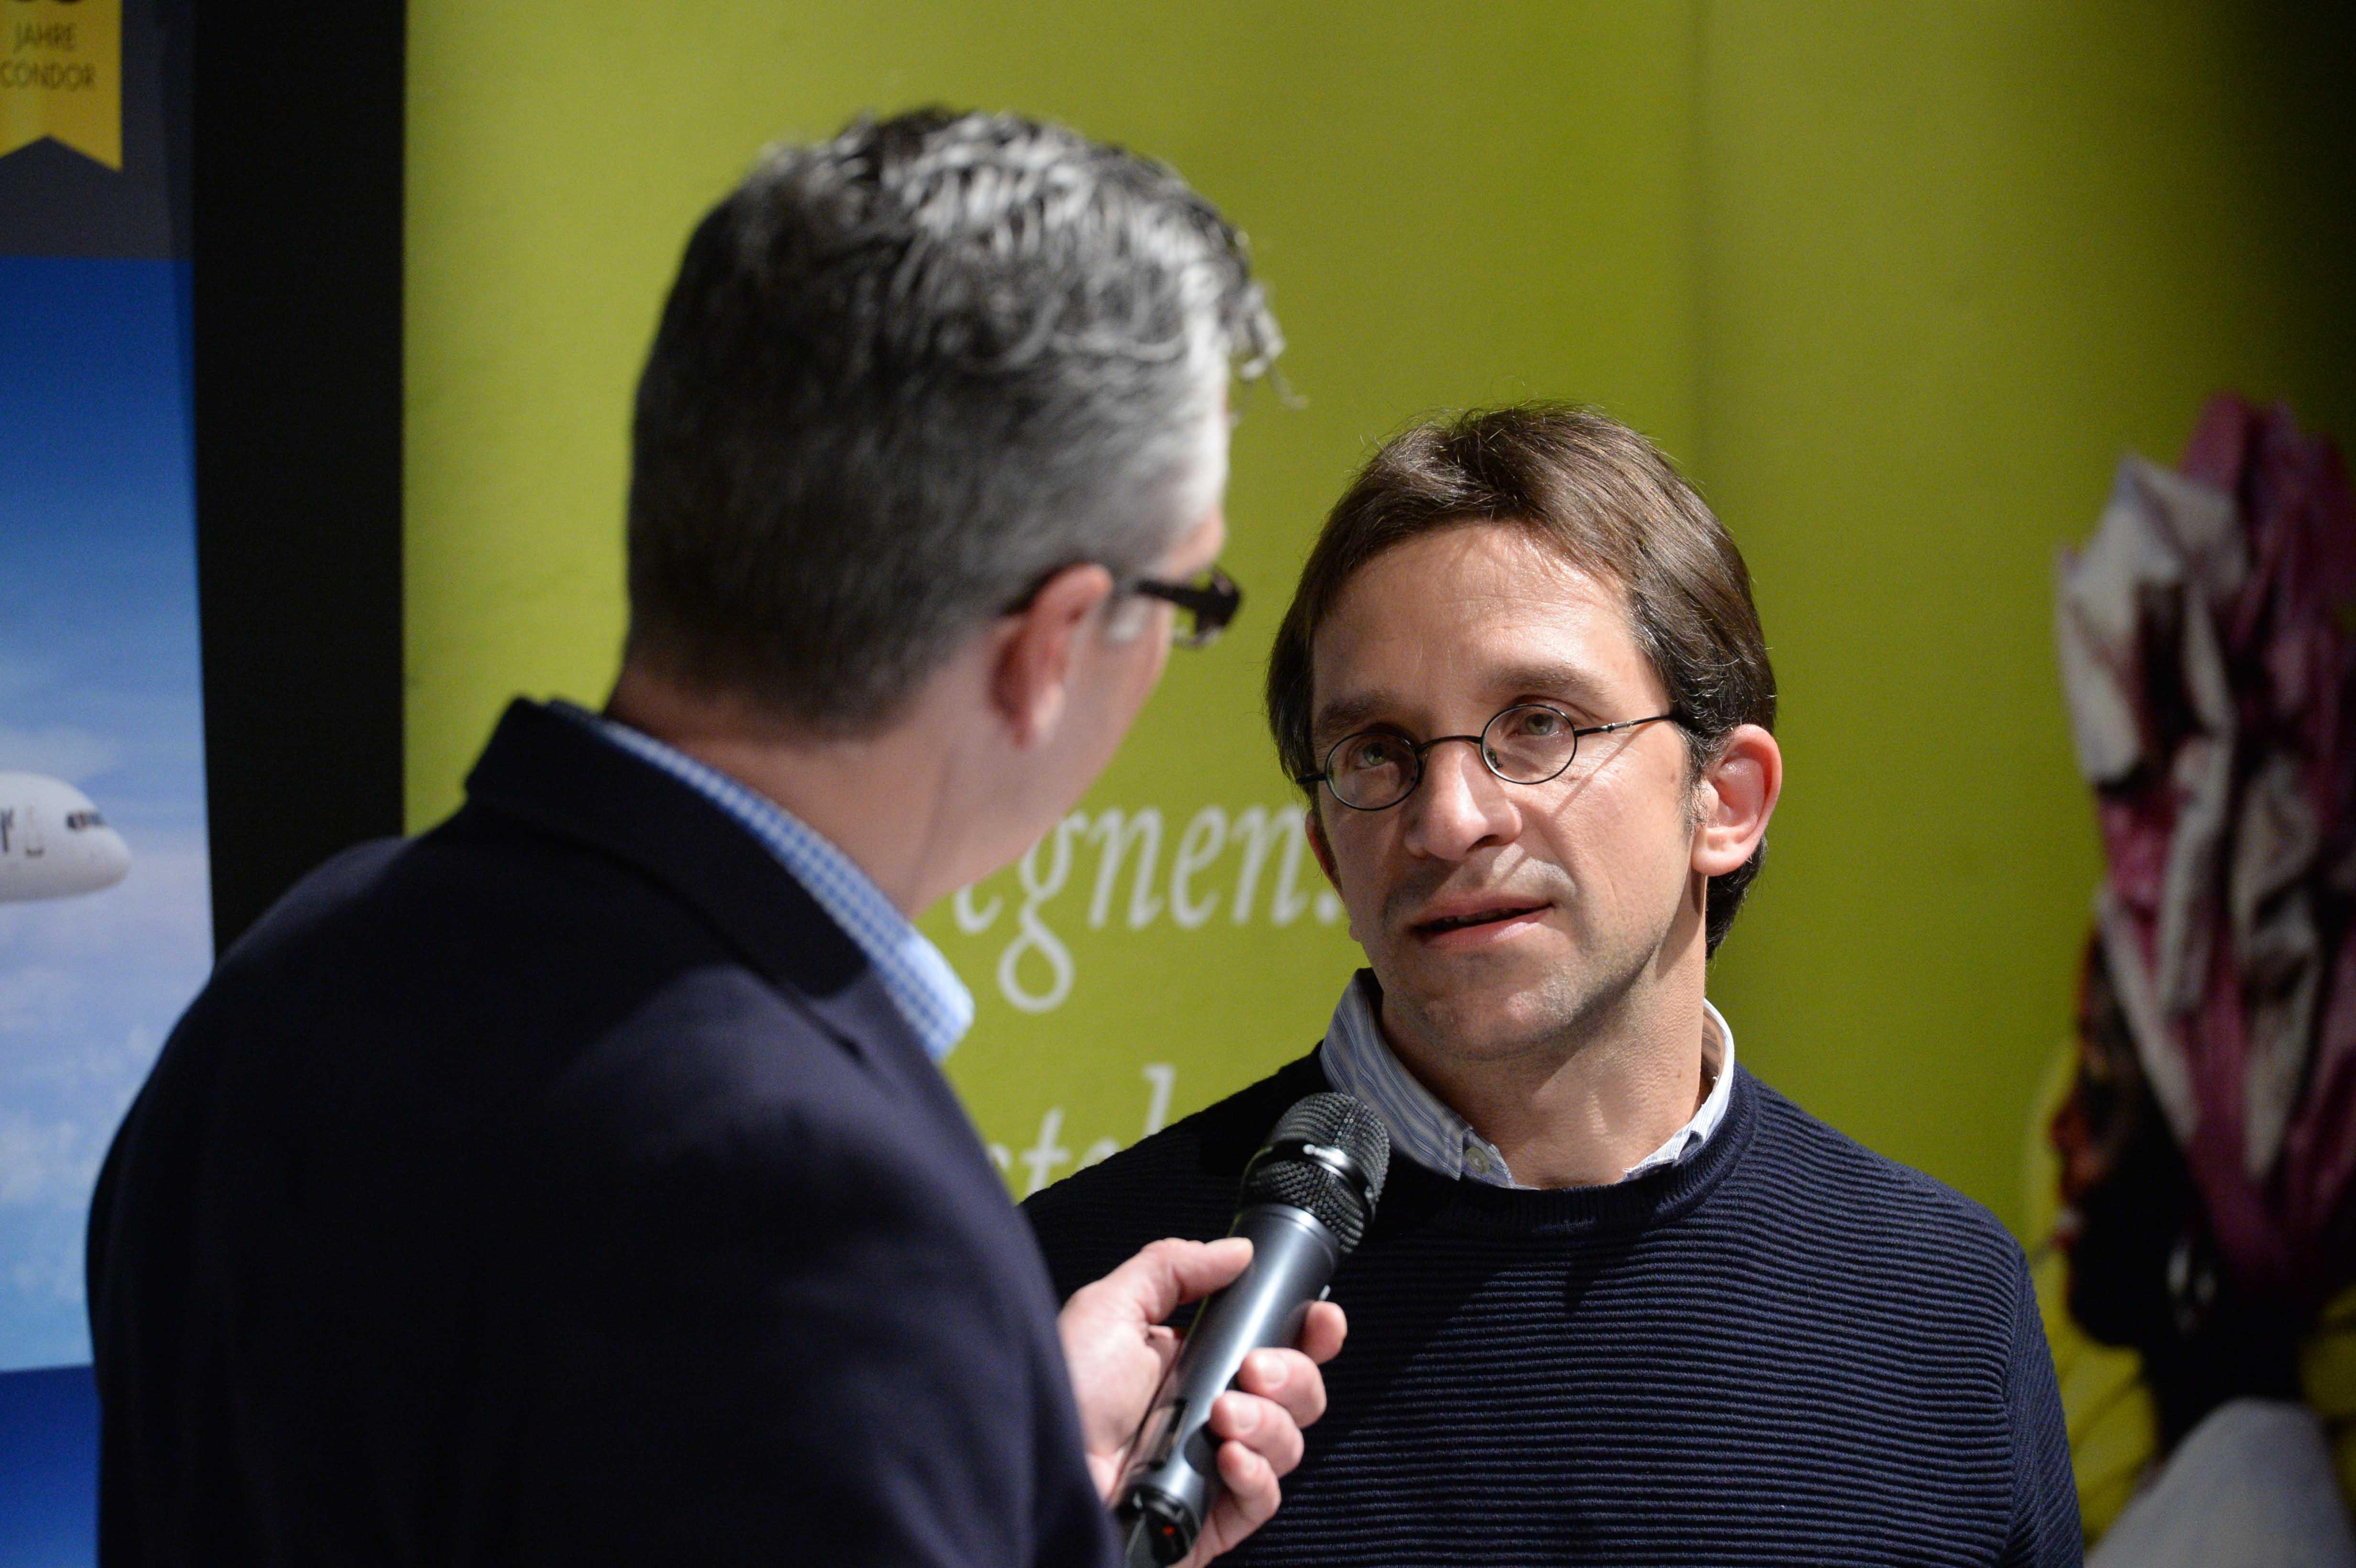 Columbus Radio Preisverleihung 2016 Gold Tilo Wagner DRadio Talk mit Holger Wetzel